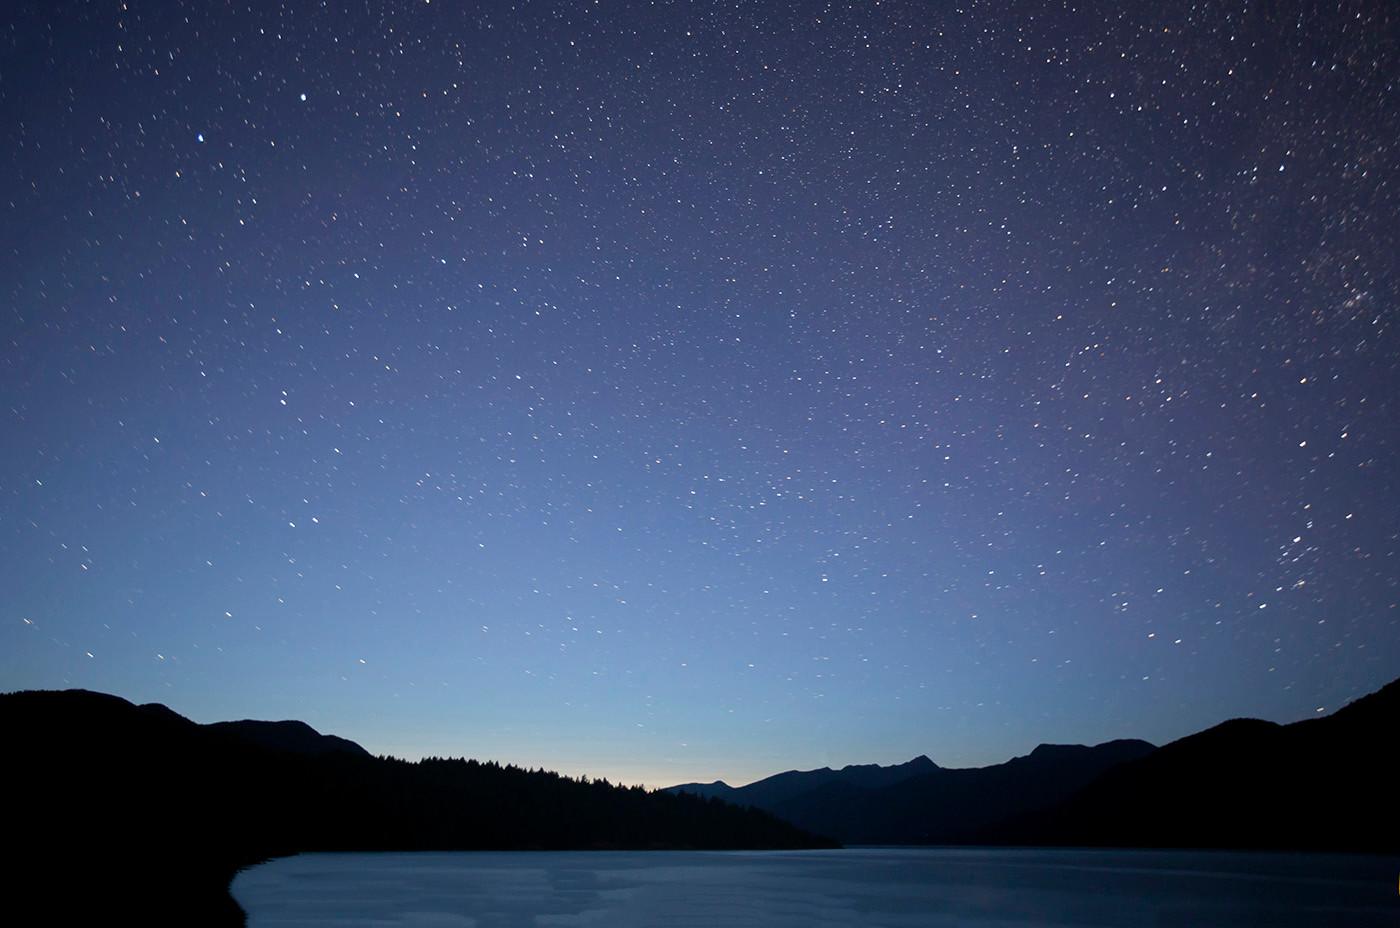 karen_morgenstern-Summer_Starry_Inlet.jp